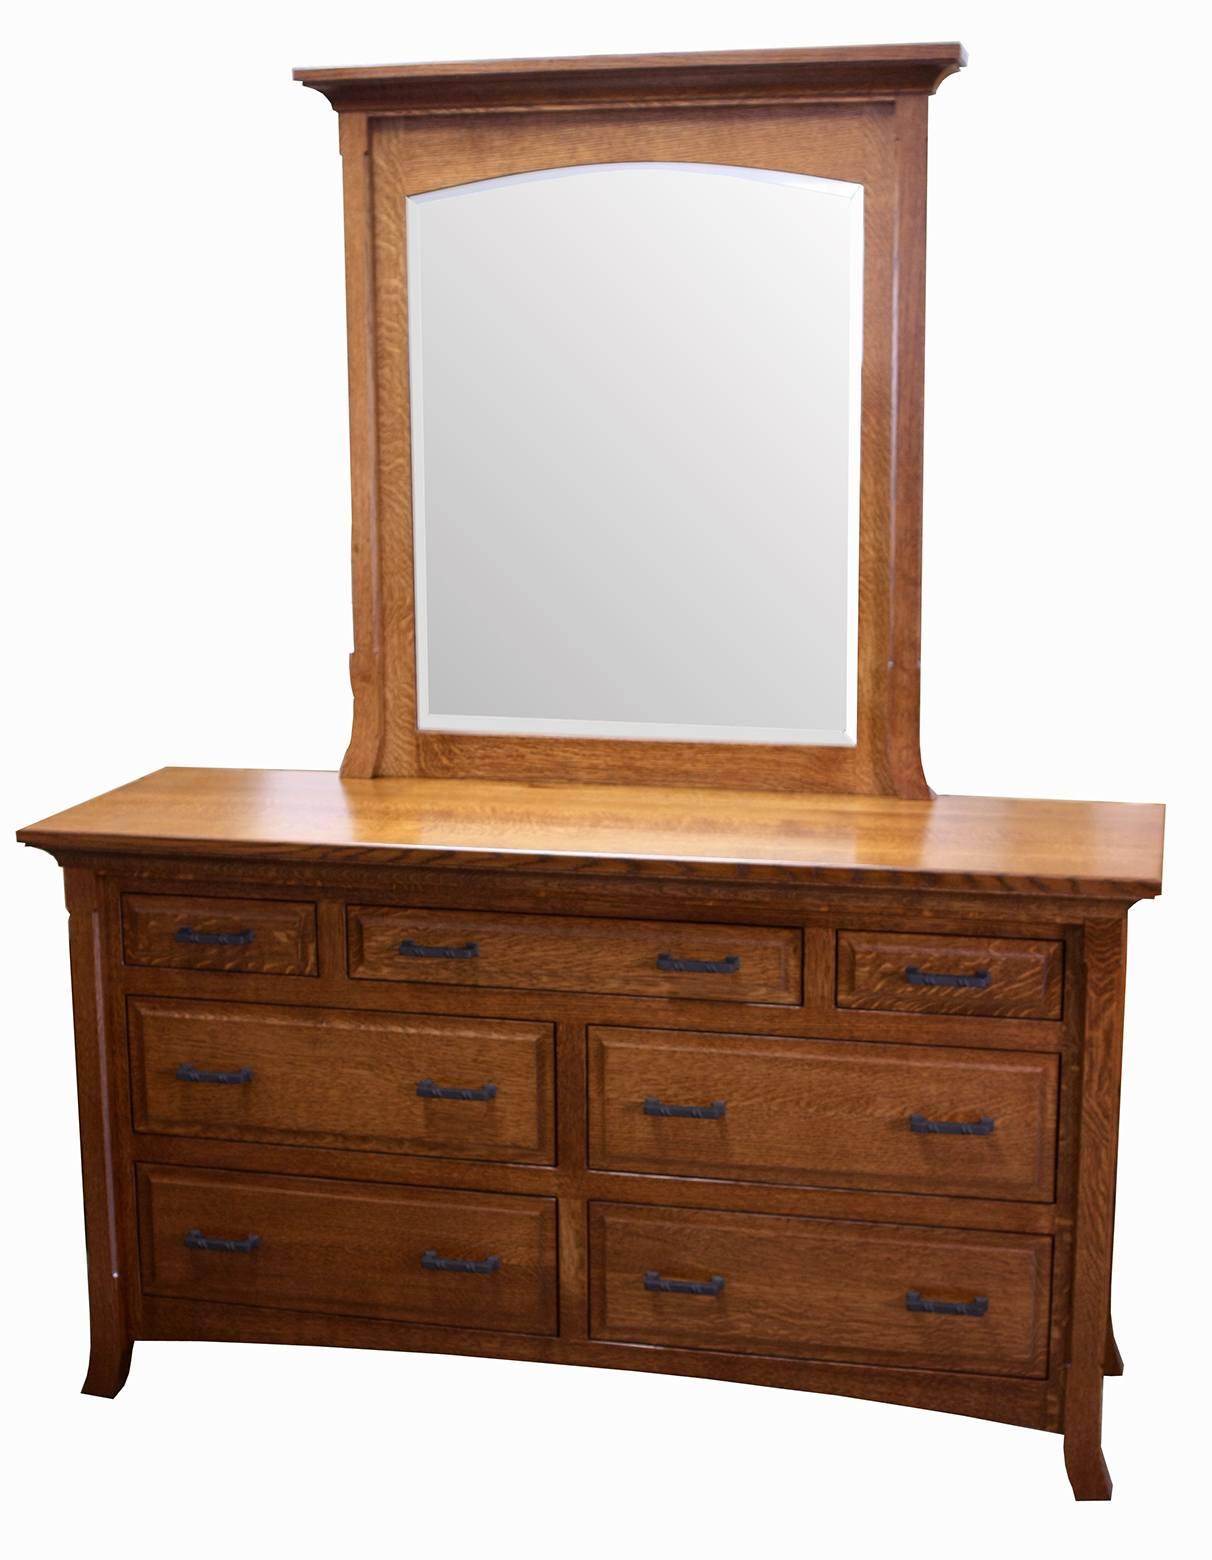 Homestead Seven-Drawer Dresser and Mirror